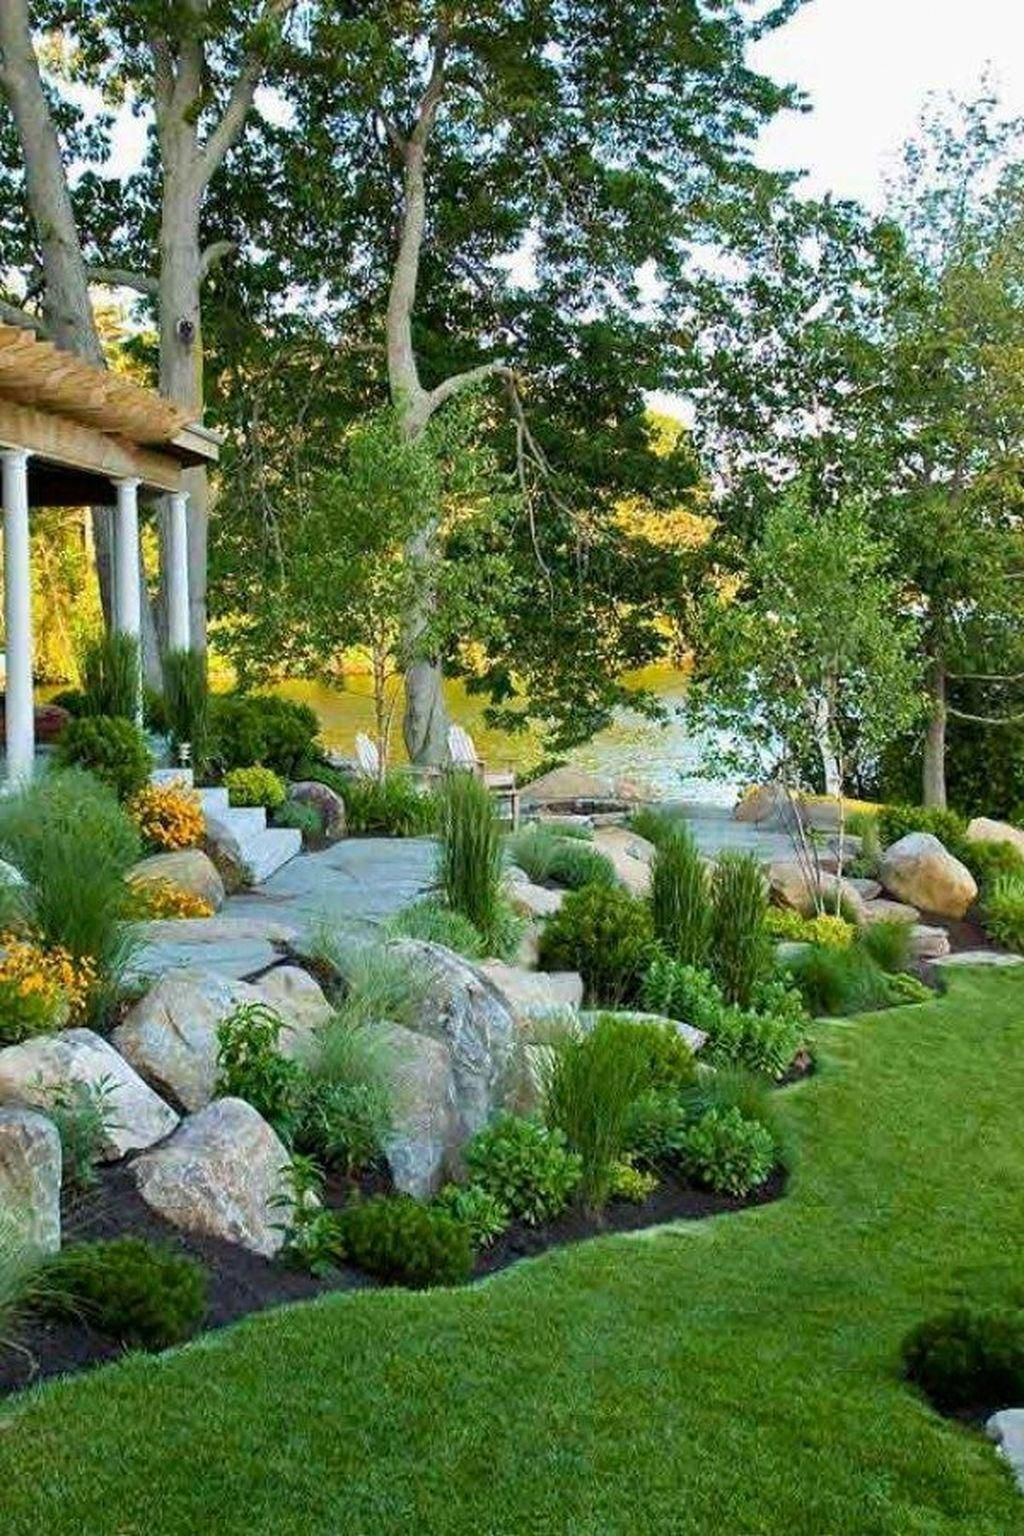 50 The Best Rock Garden Landscaping Ideas To Make A Beautiful